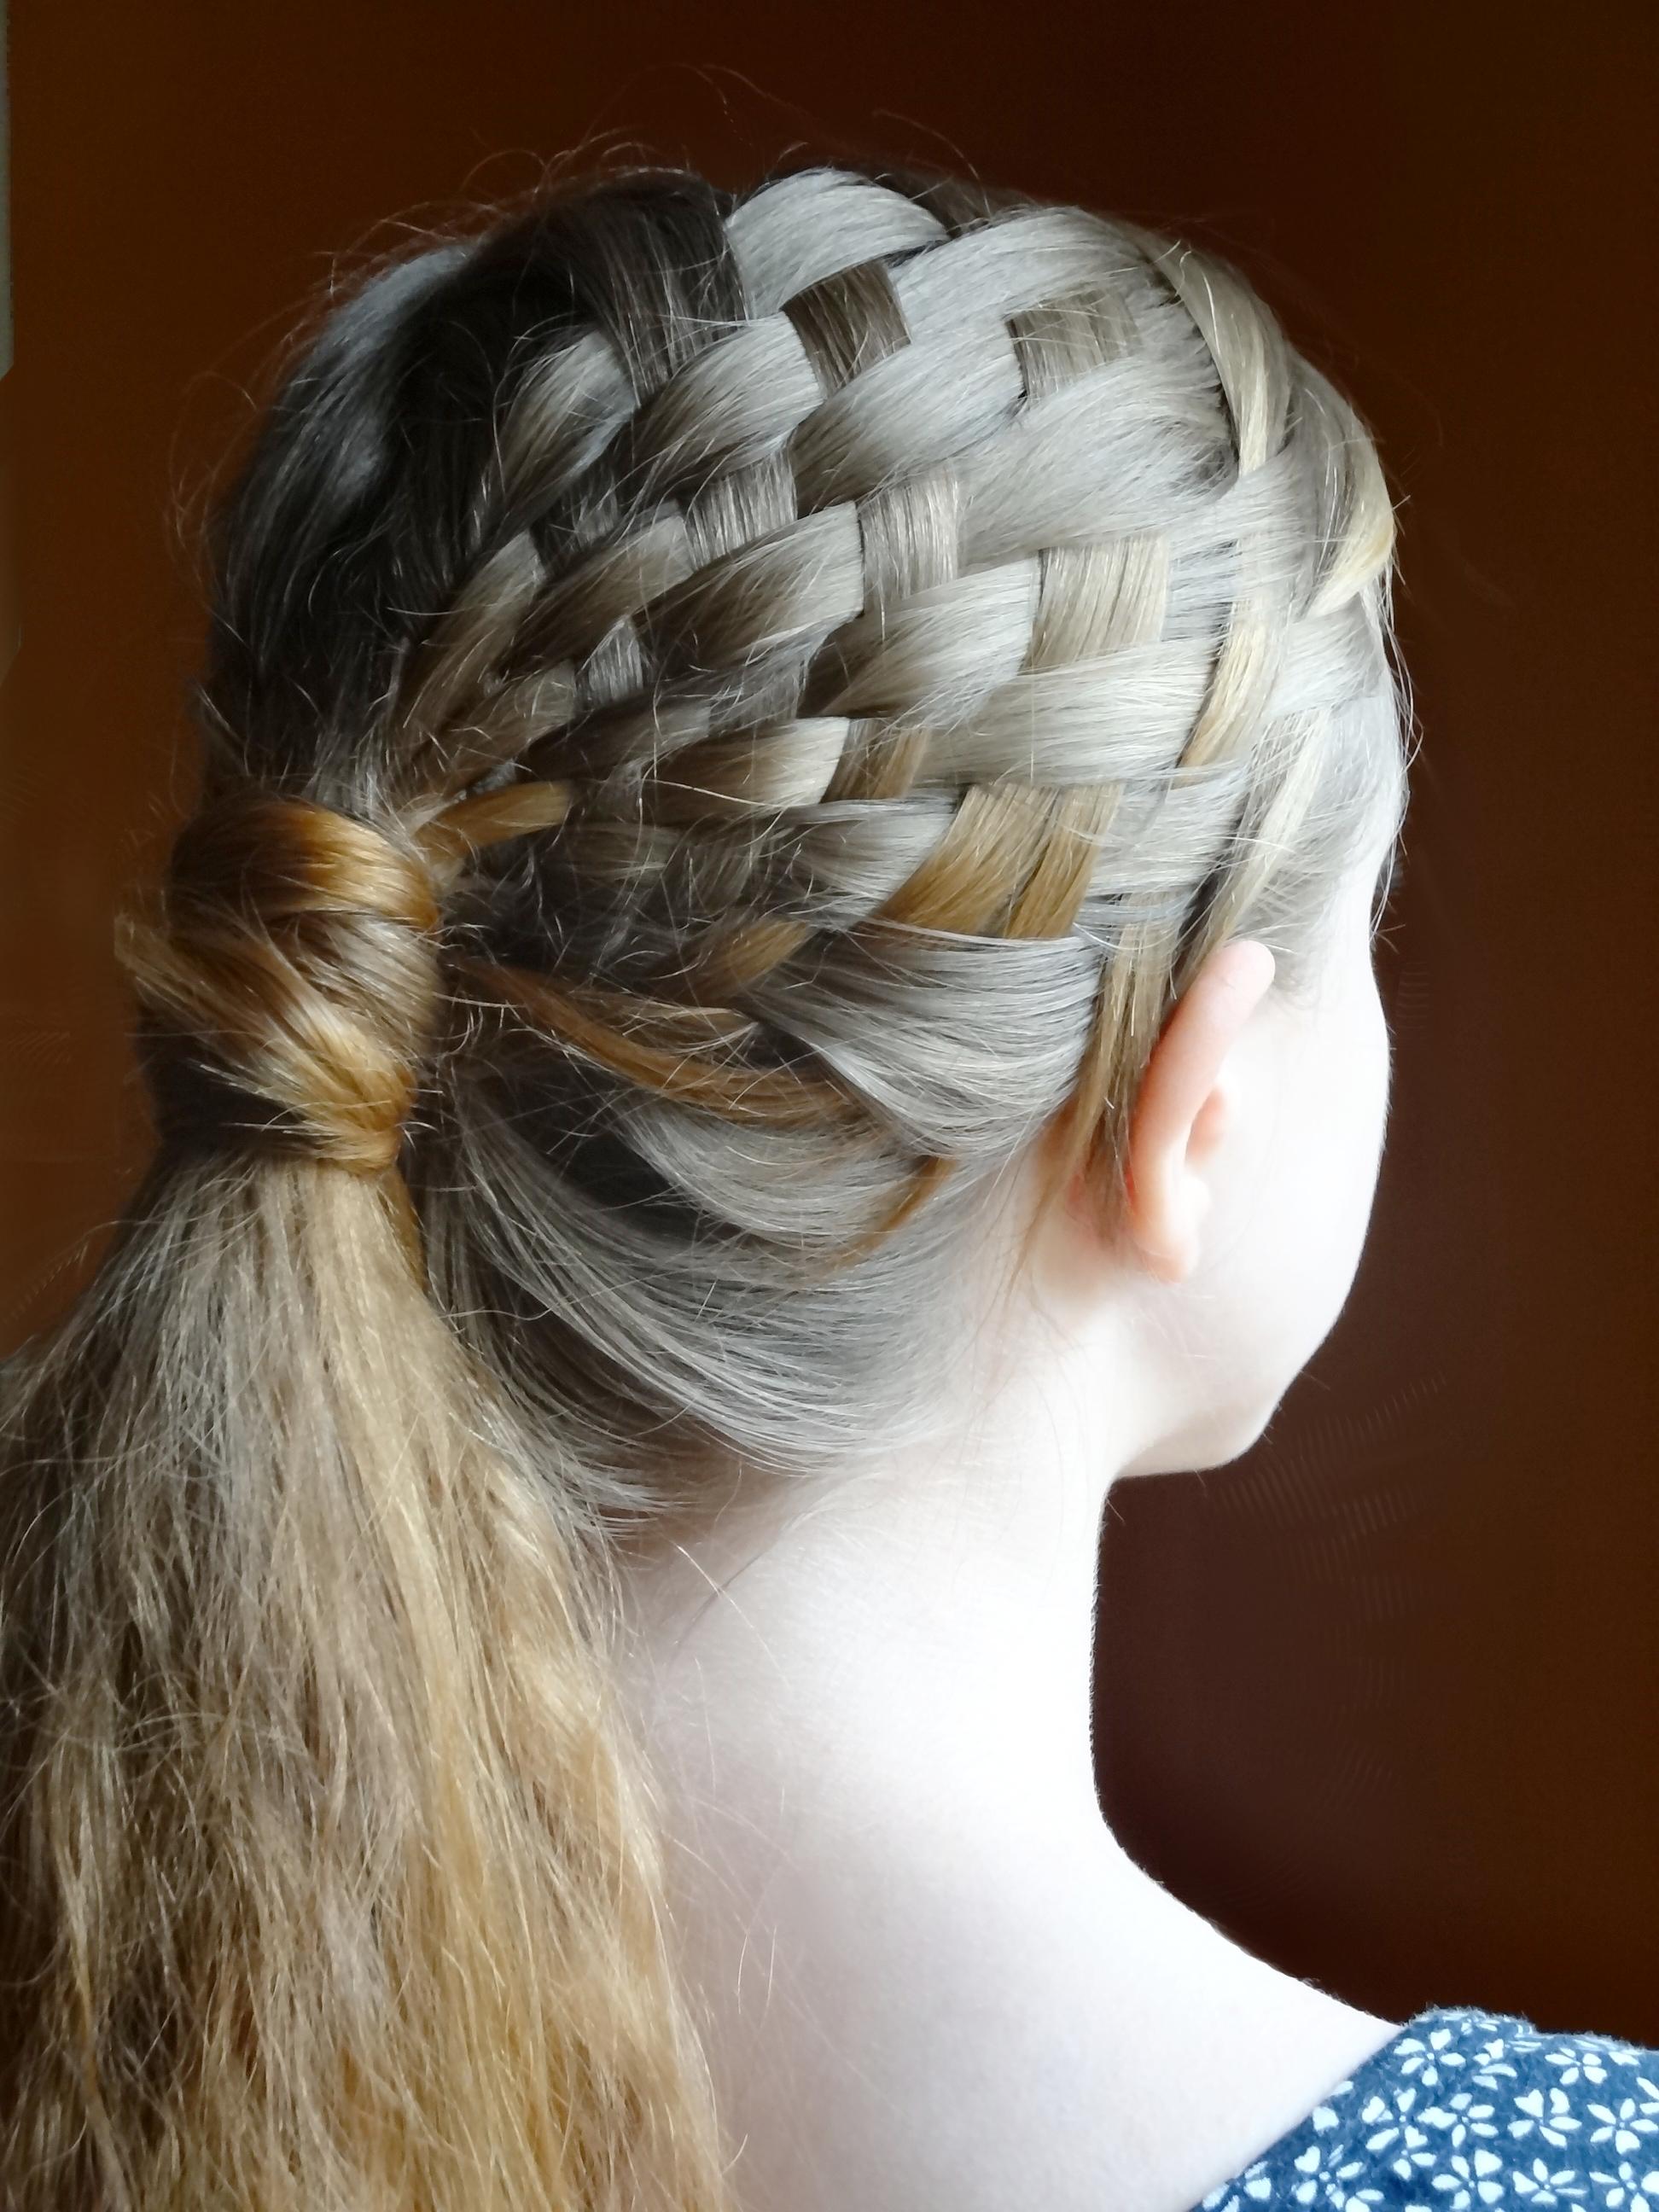 Frisur Affenschaukel Anleitung  schneller haare wachsen